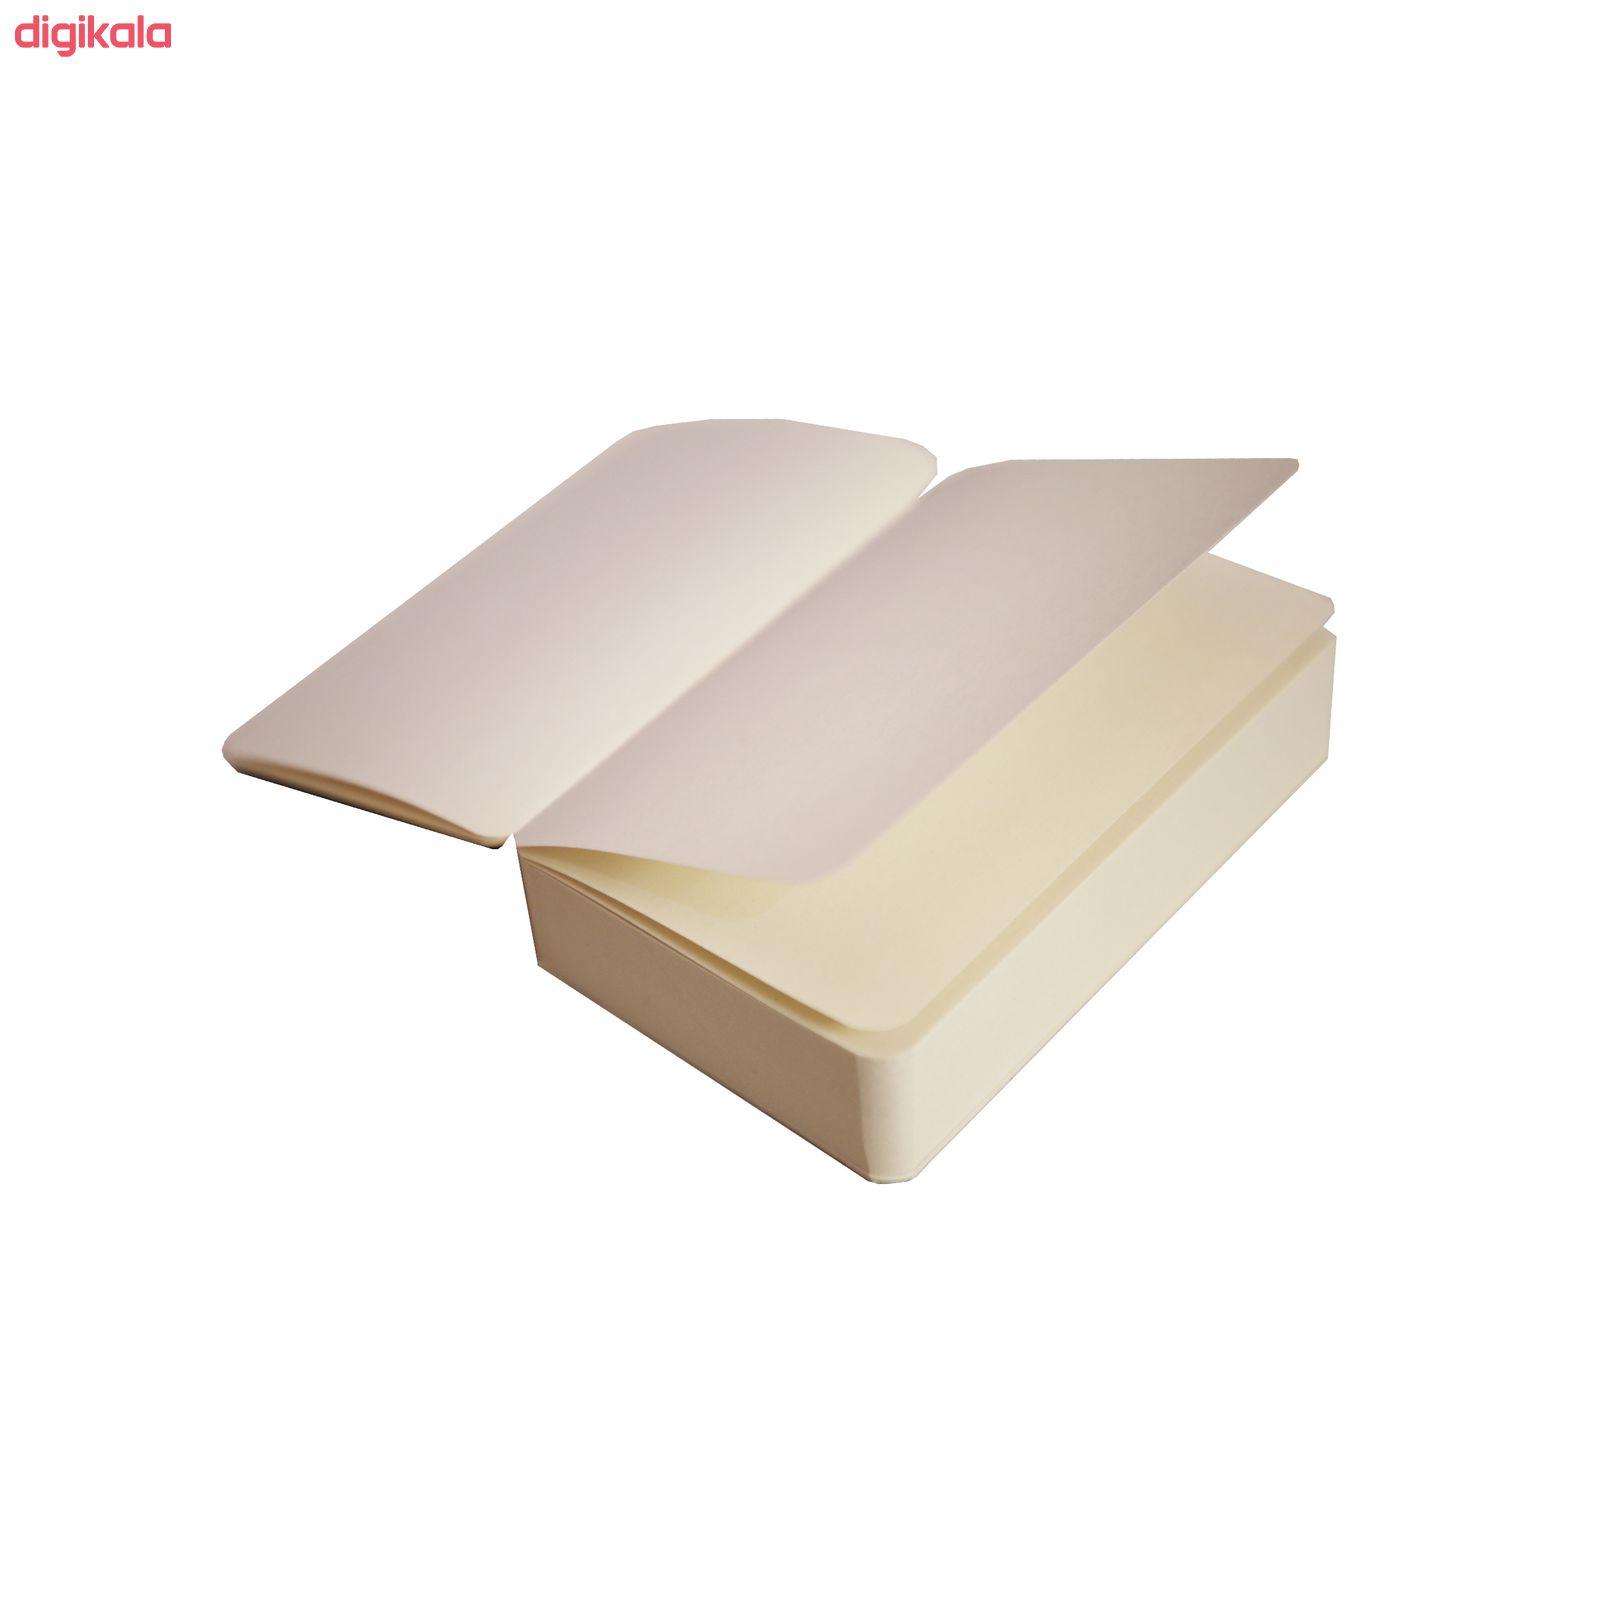 کاغذ یادداشت هرمز کد 601 بسته 200 عددی main 1 4